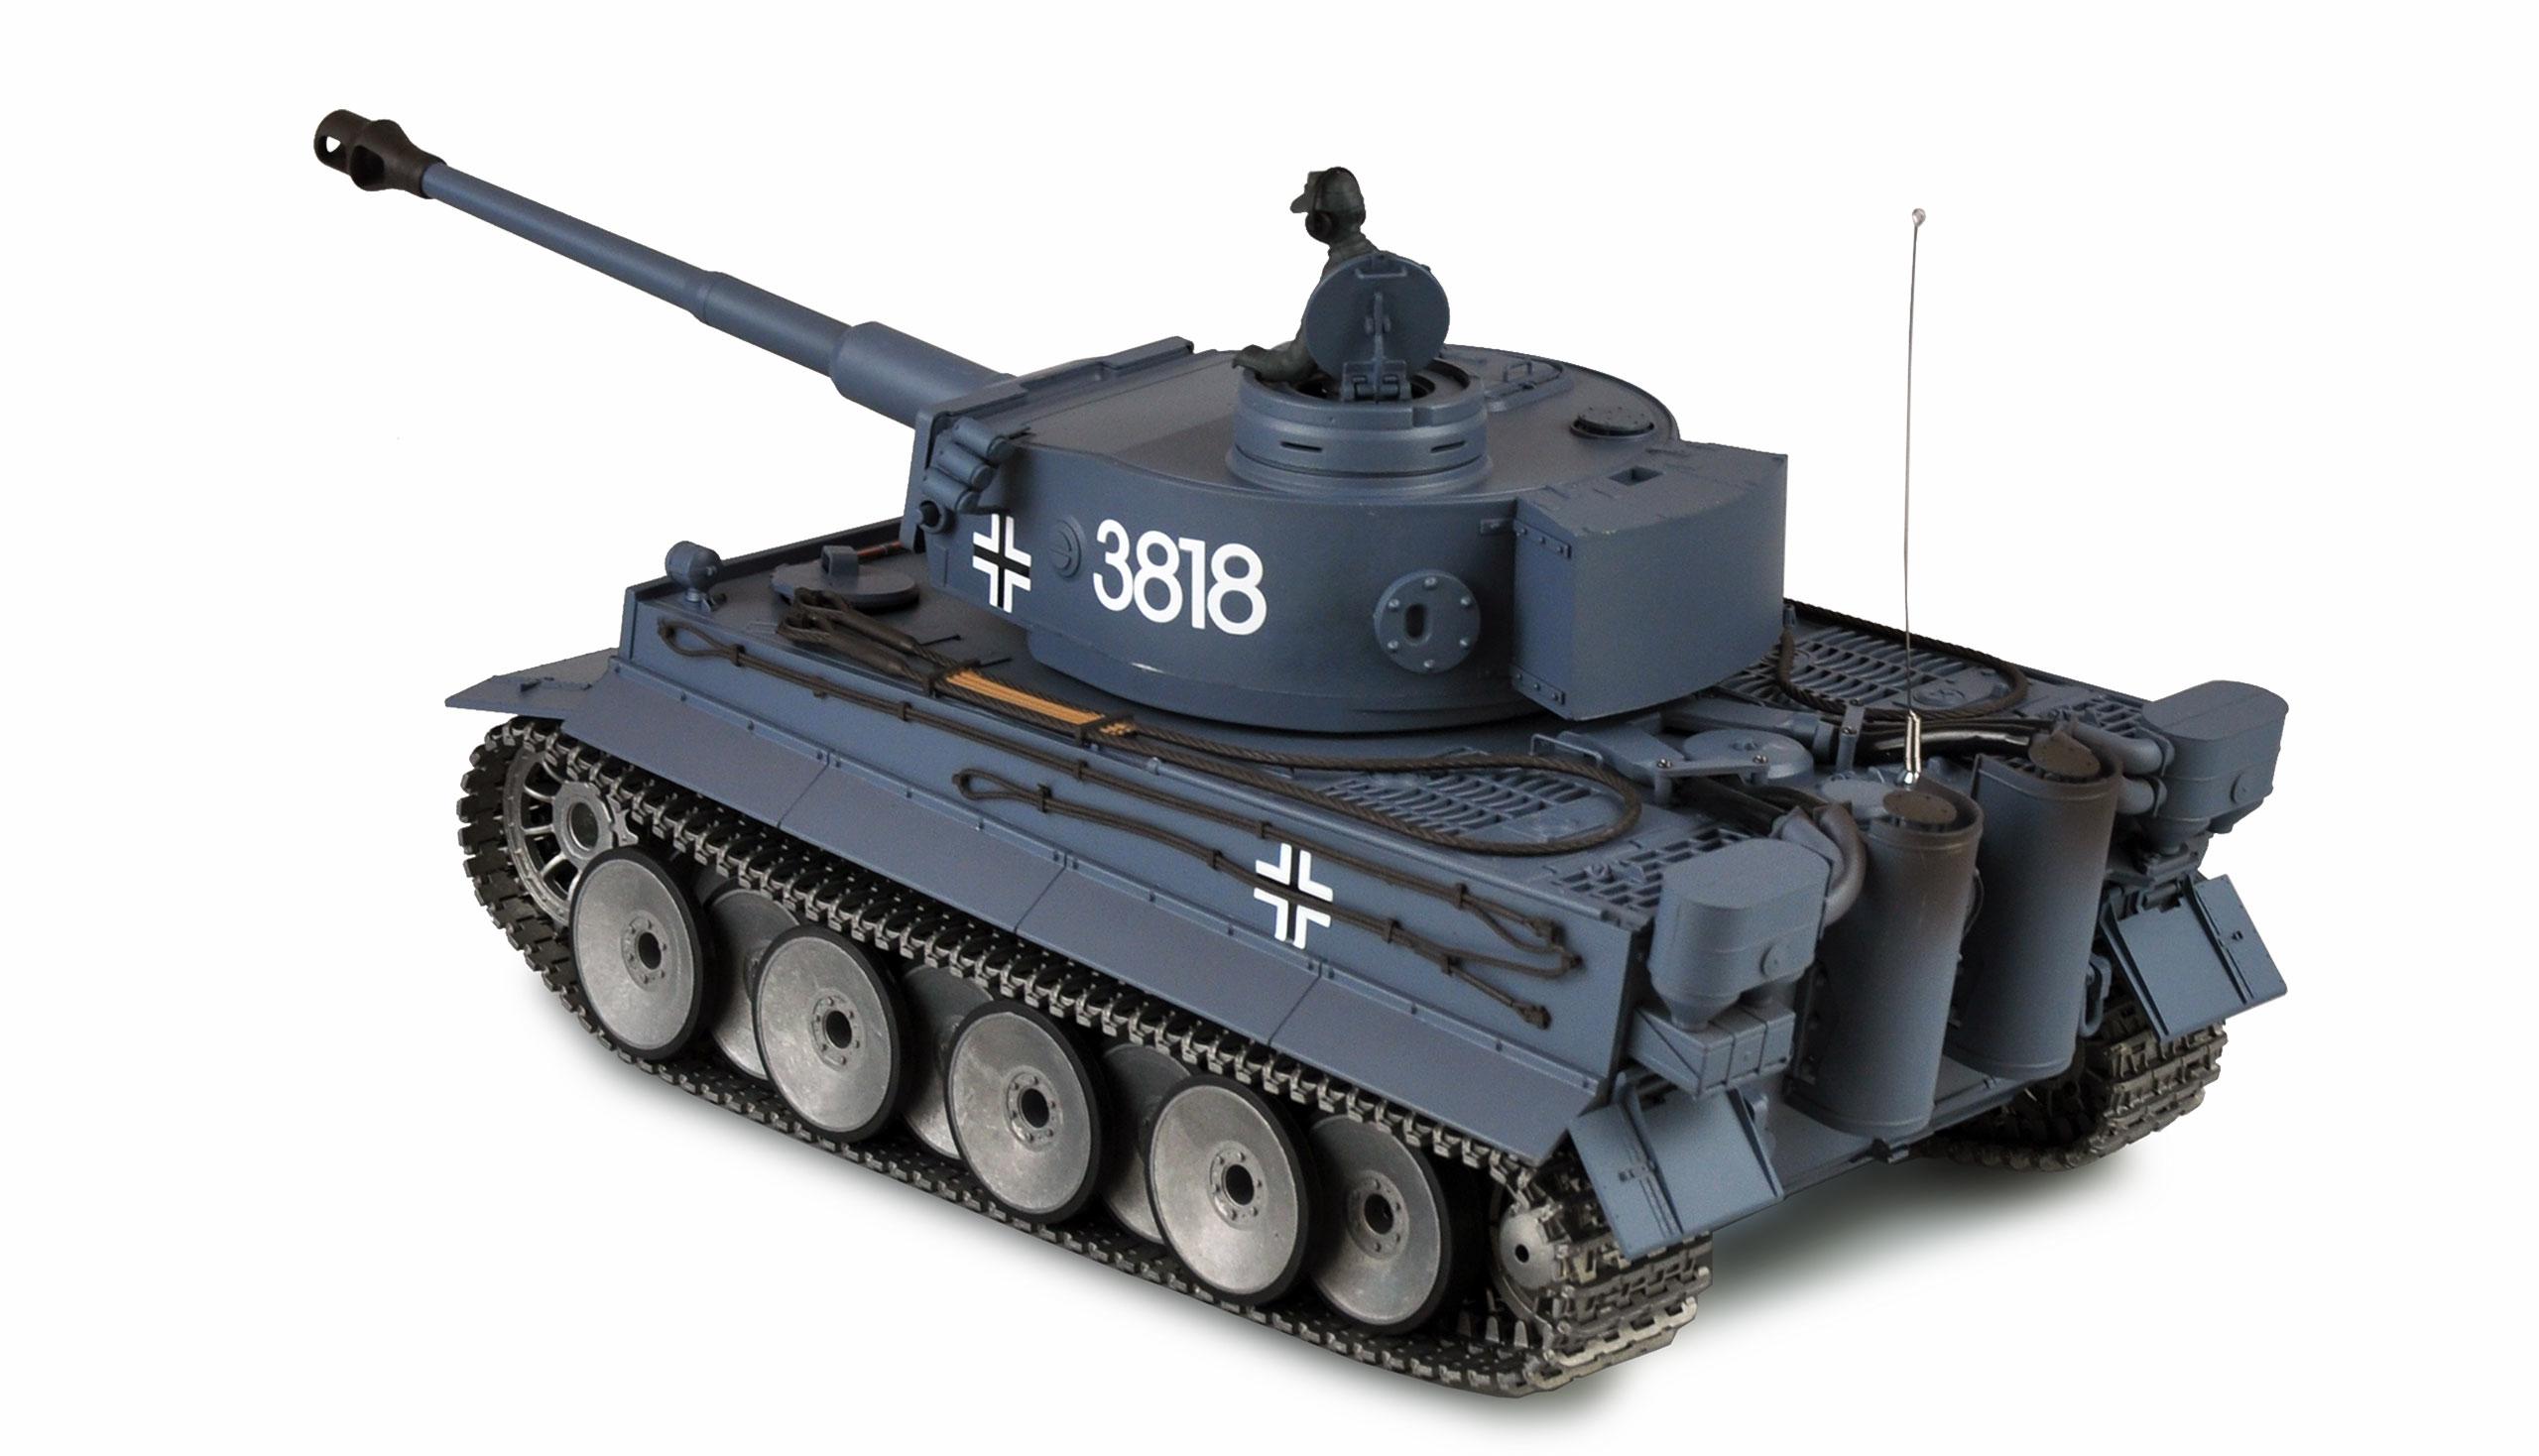 Amewi Tiger I - Funkgesteuerter (RC) Panzer - Elektromotor - 1:16 - Betriebsbereit (RTR) - Junge - 14 Jahr(e)